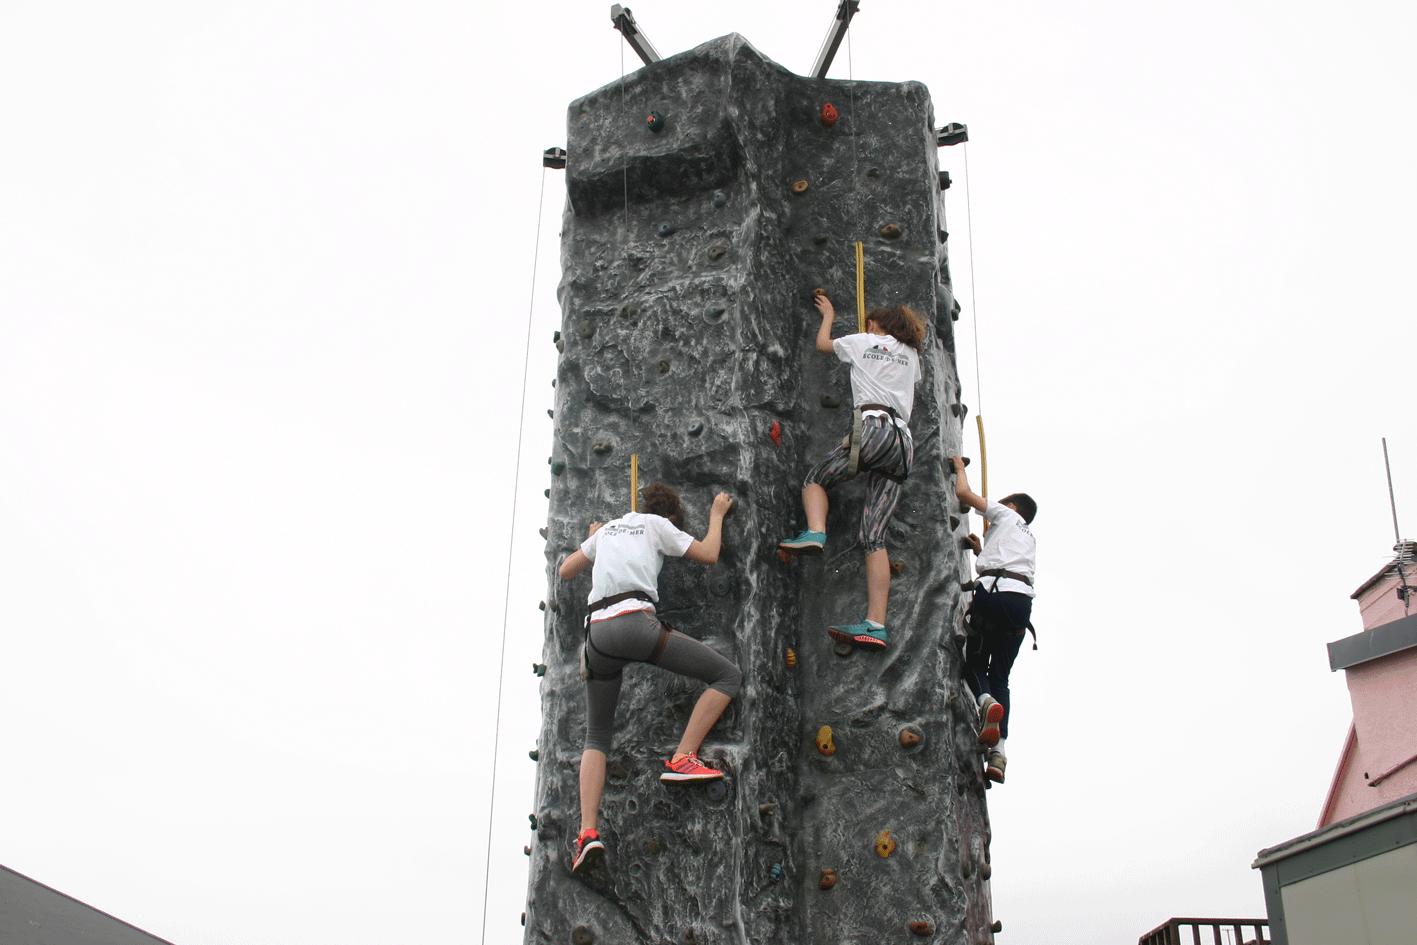 Rock Climbing & Abseiling 2016 ardmore ecole de mer